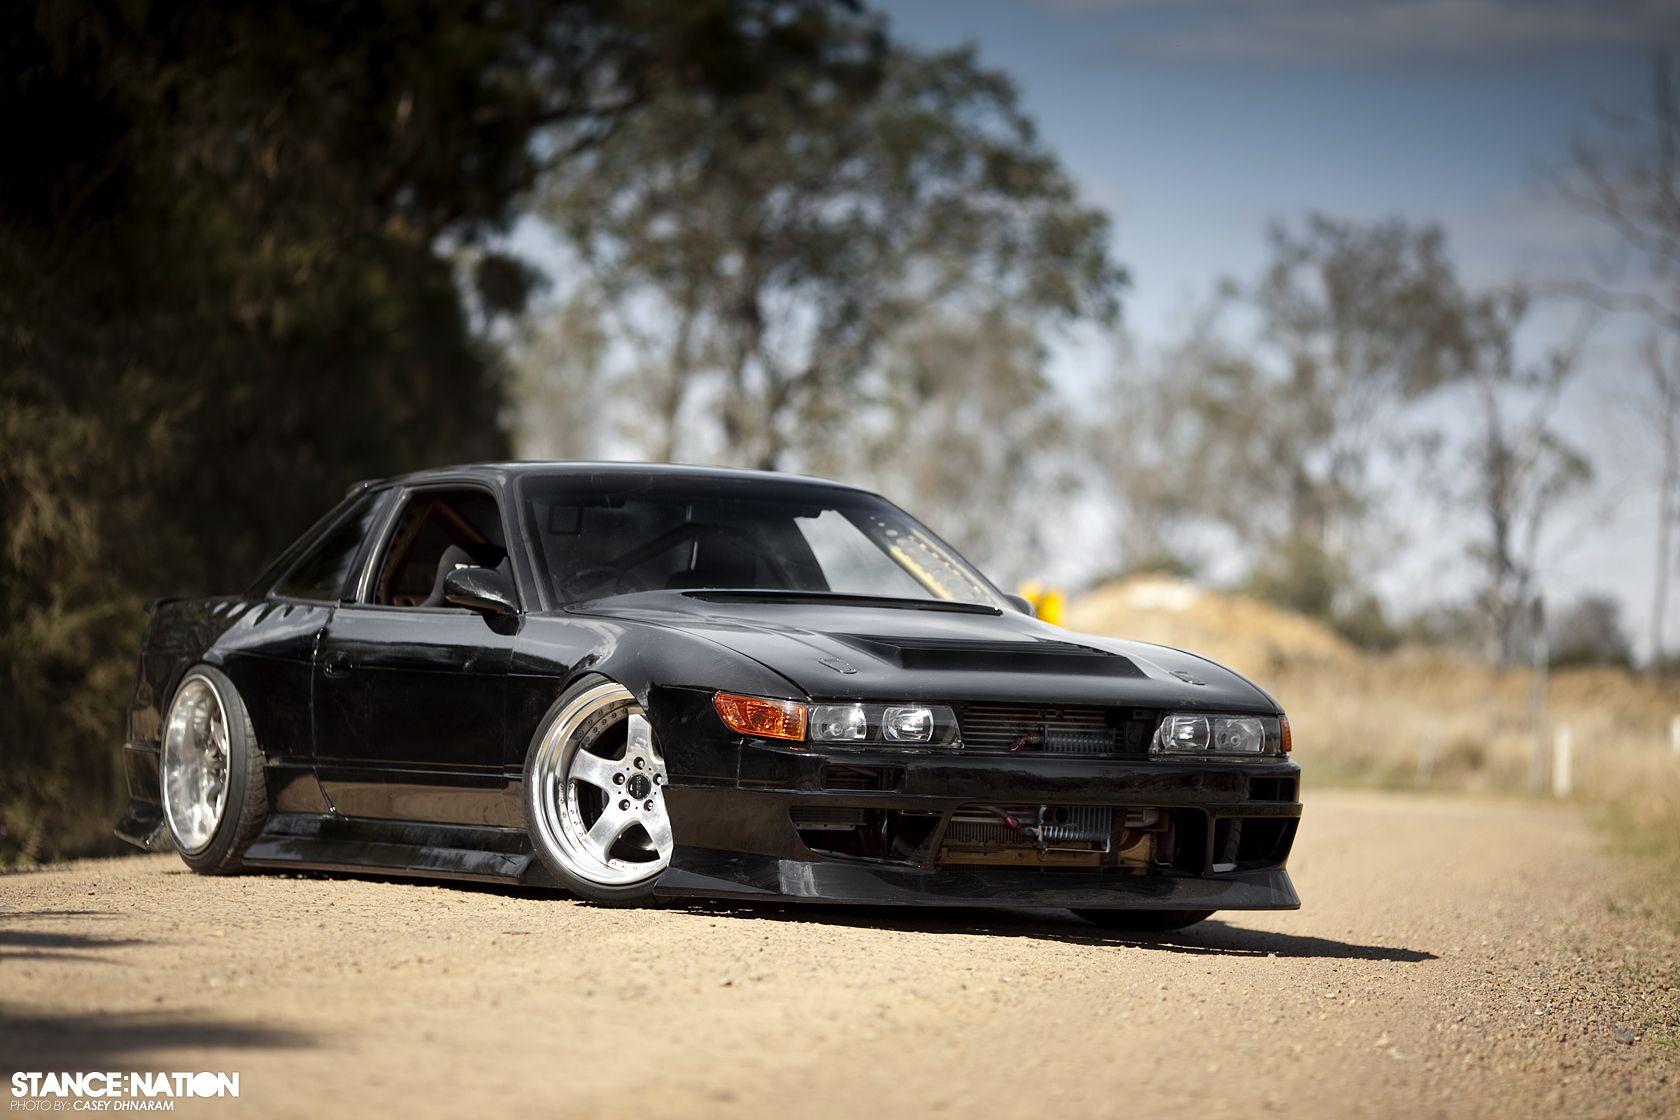 S13 Stance Retro cars, Japanese cars, Drifting